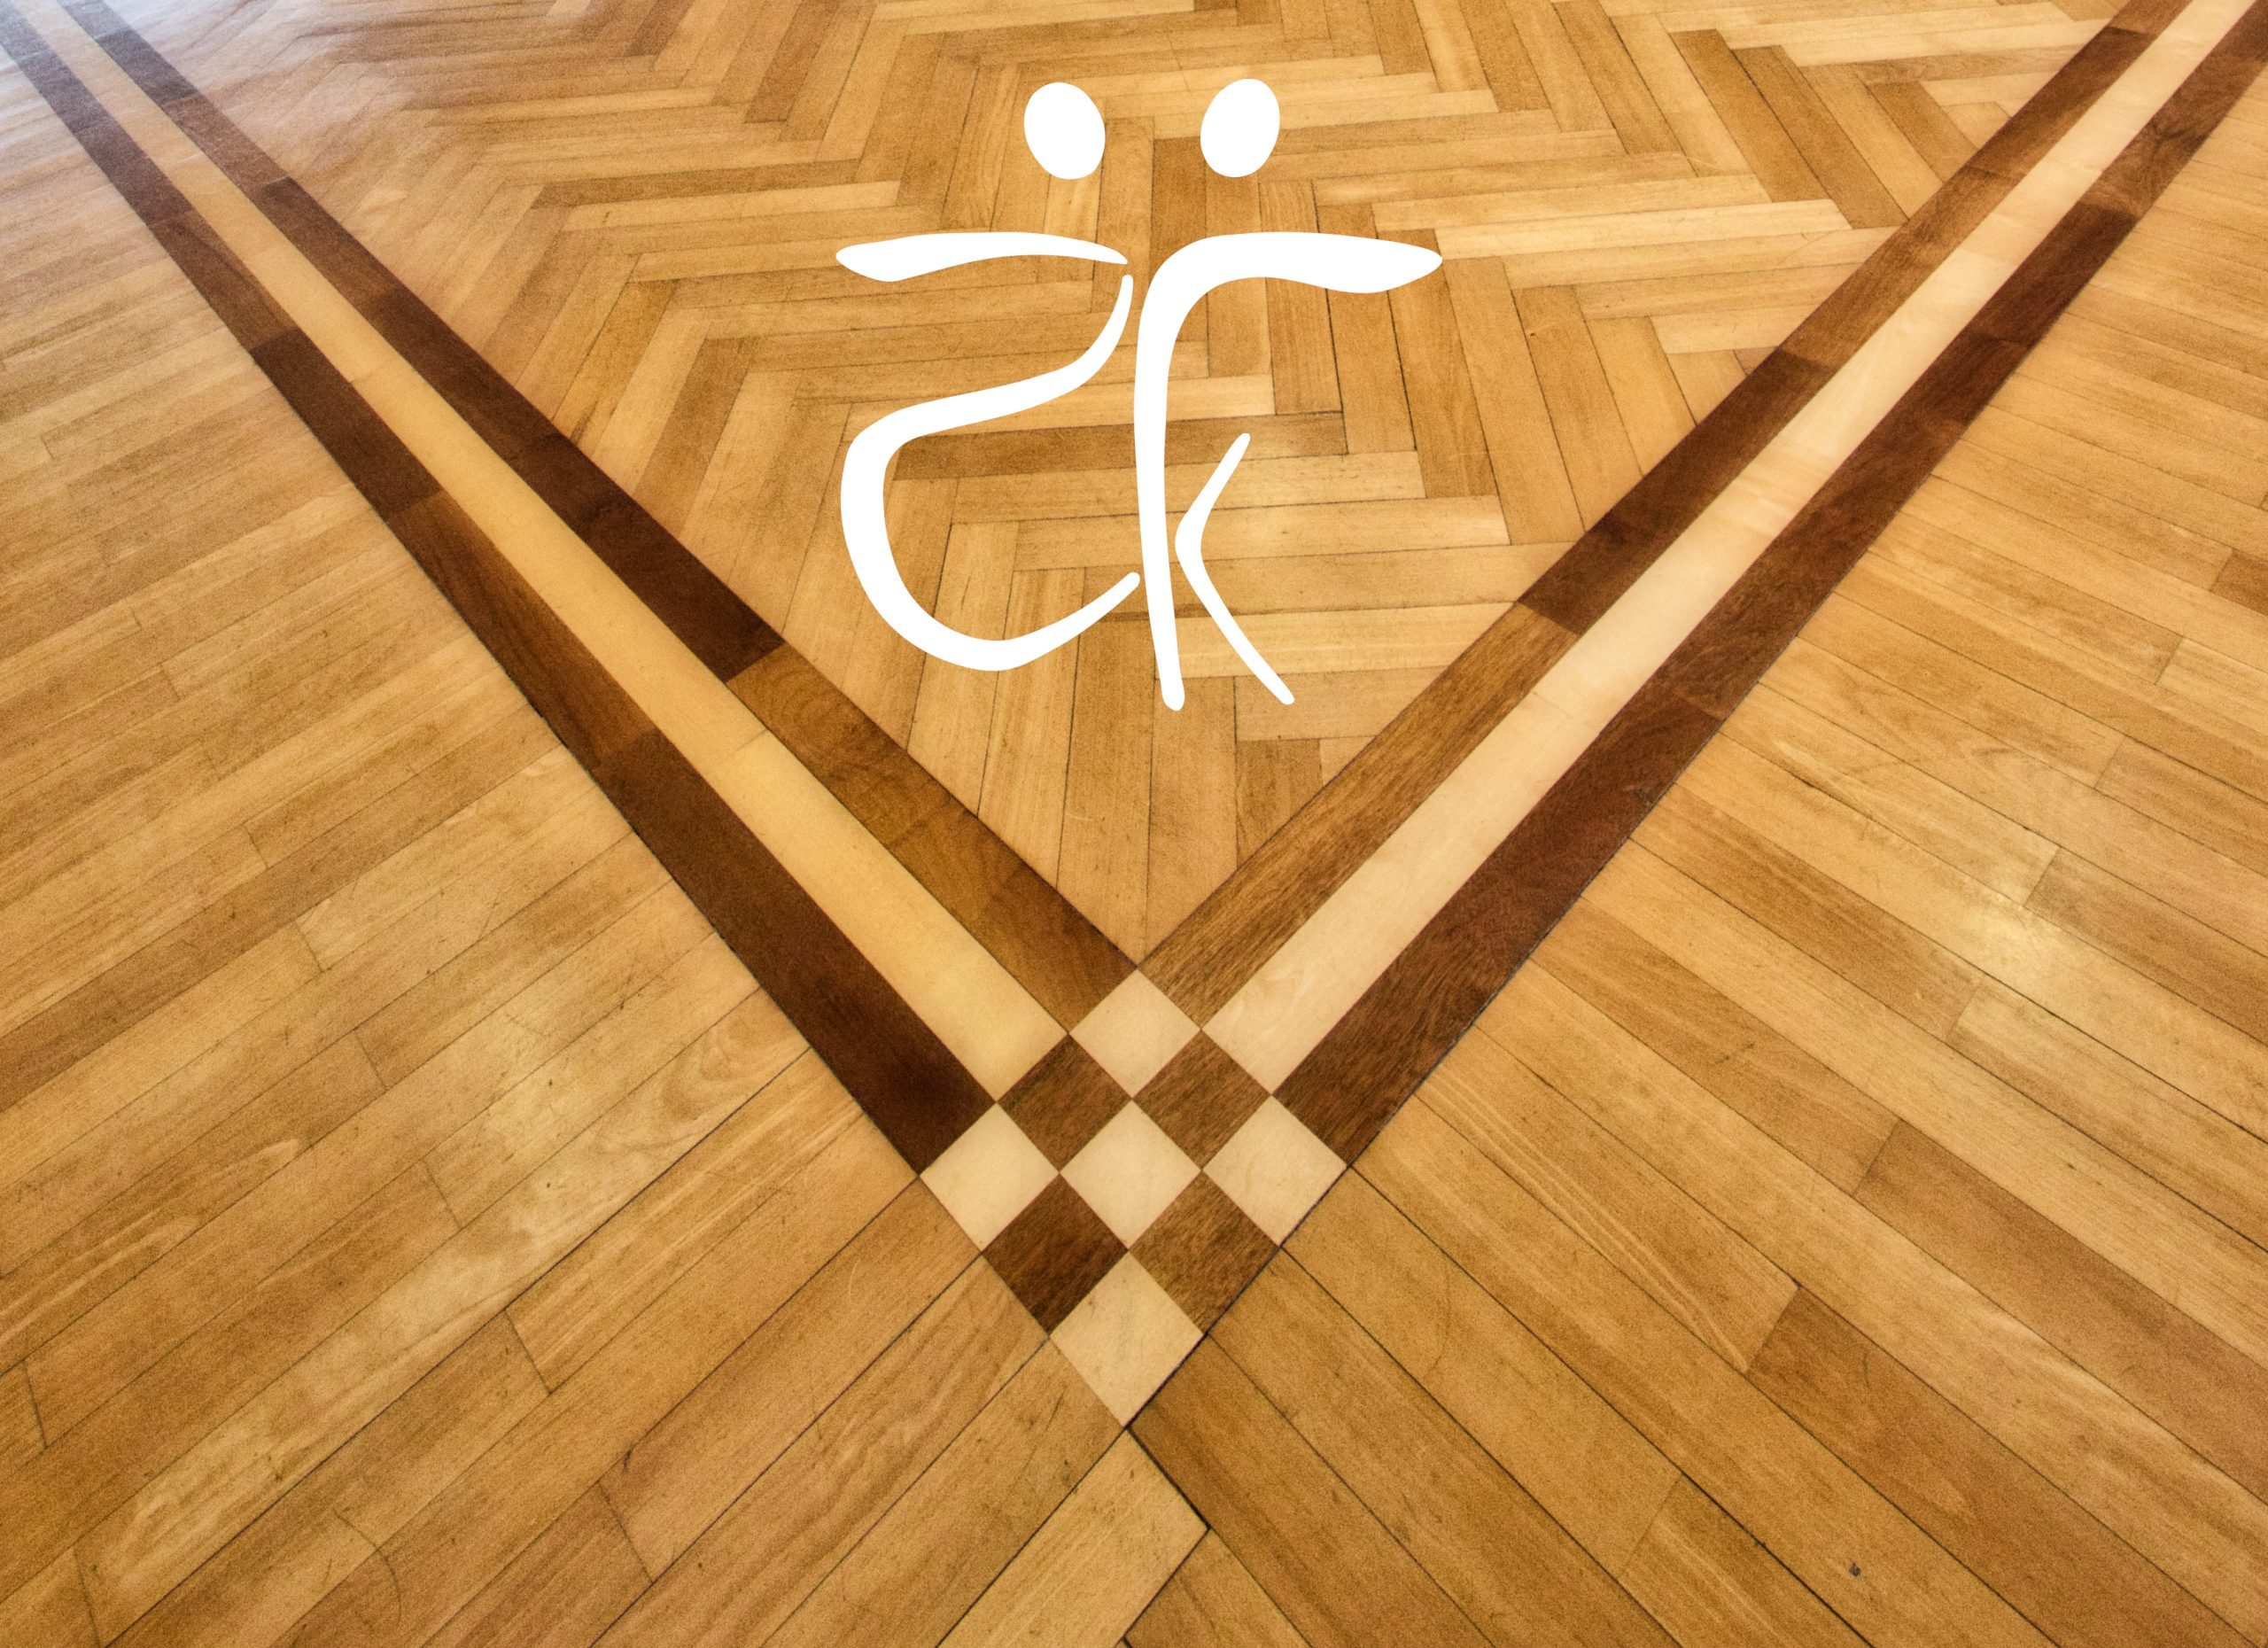 Tanzclub Konstanz Newsletter